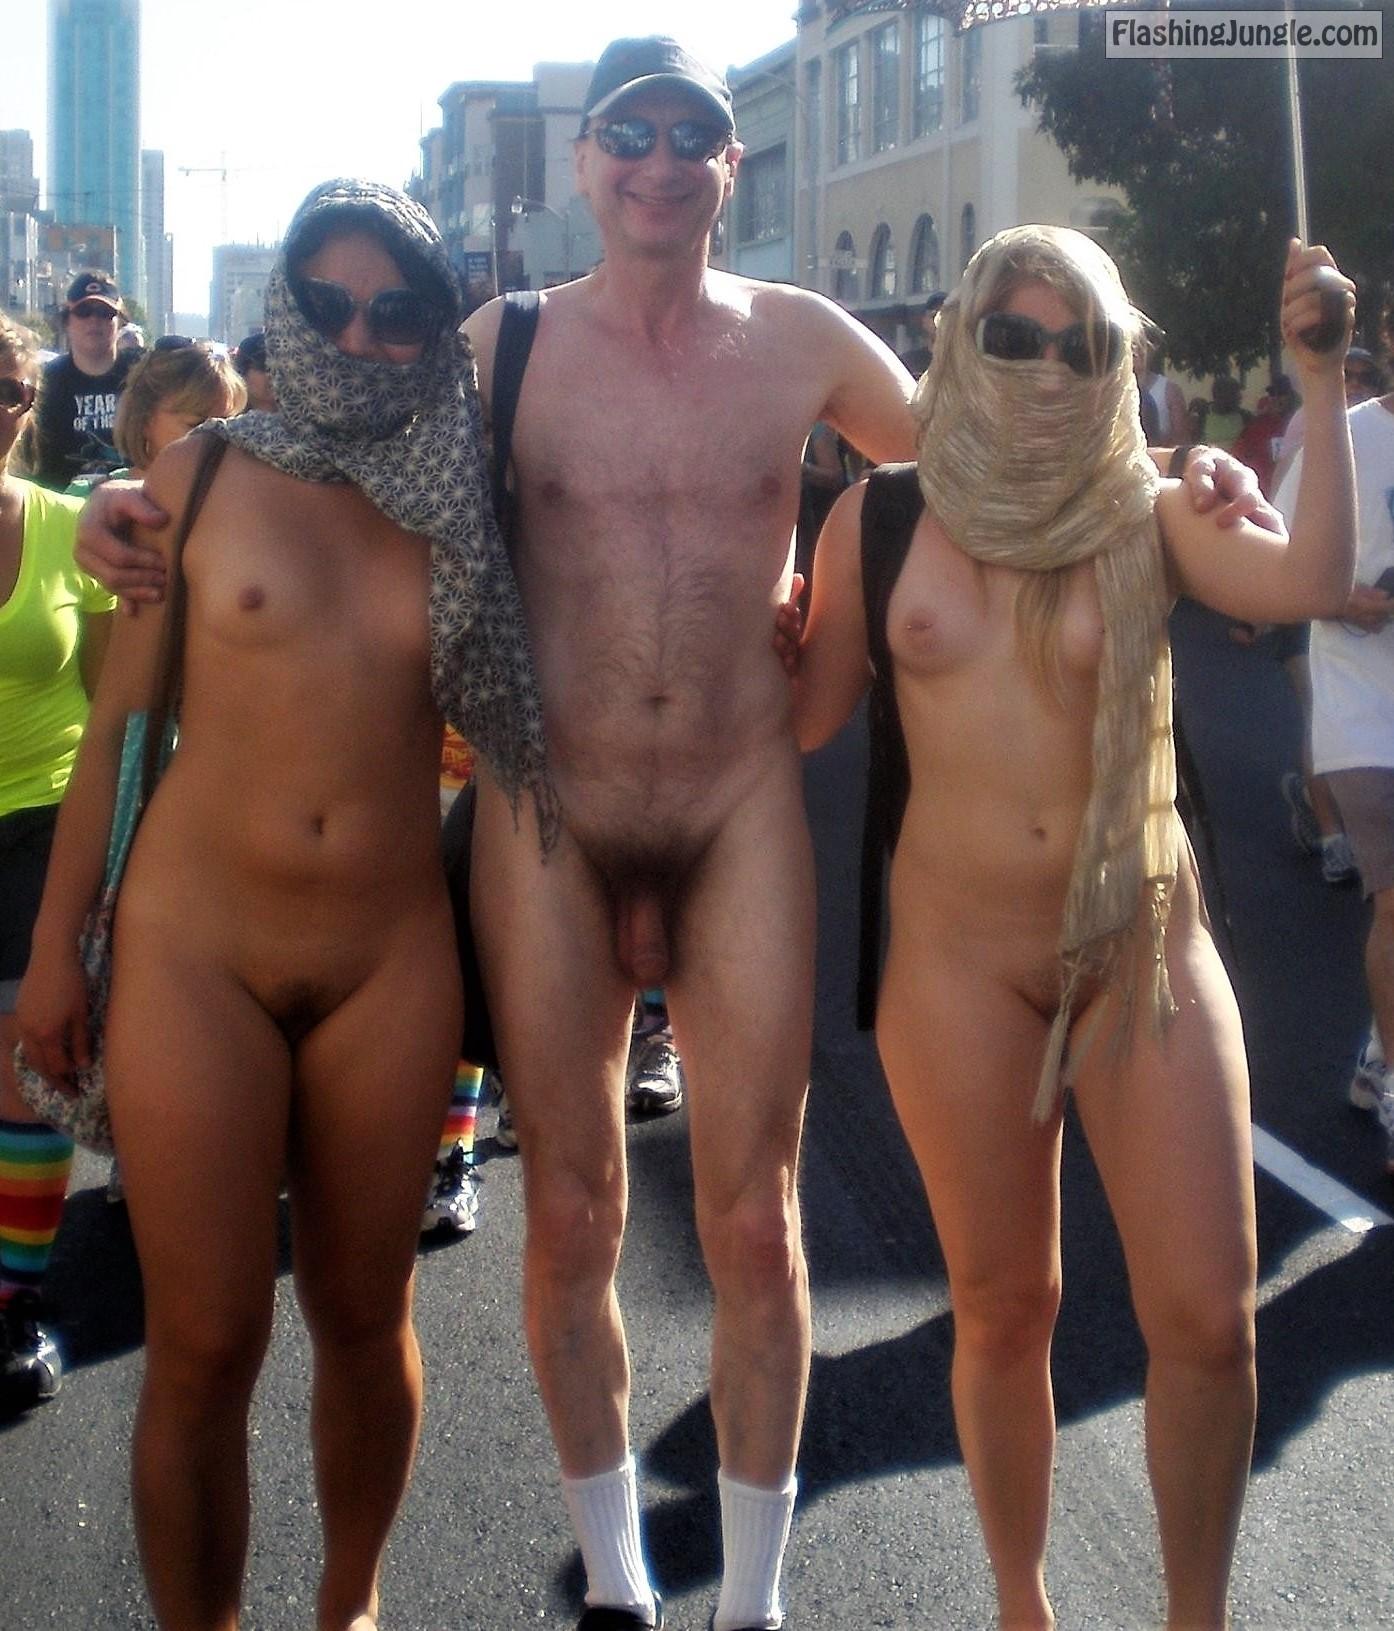 In public nudity List of